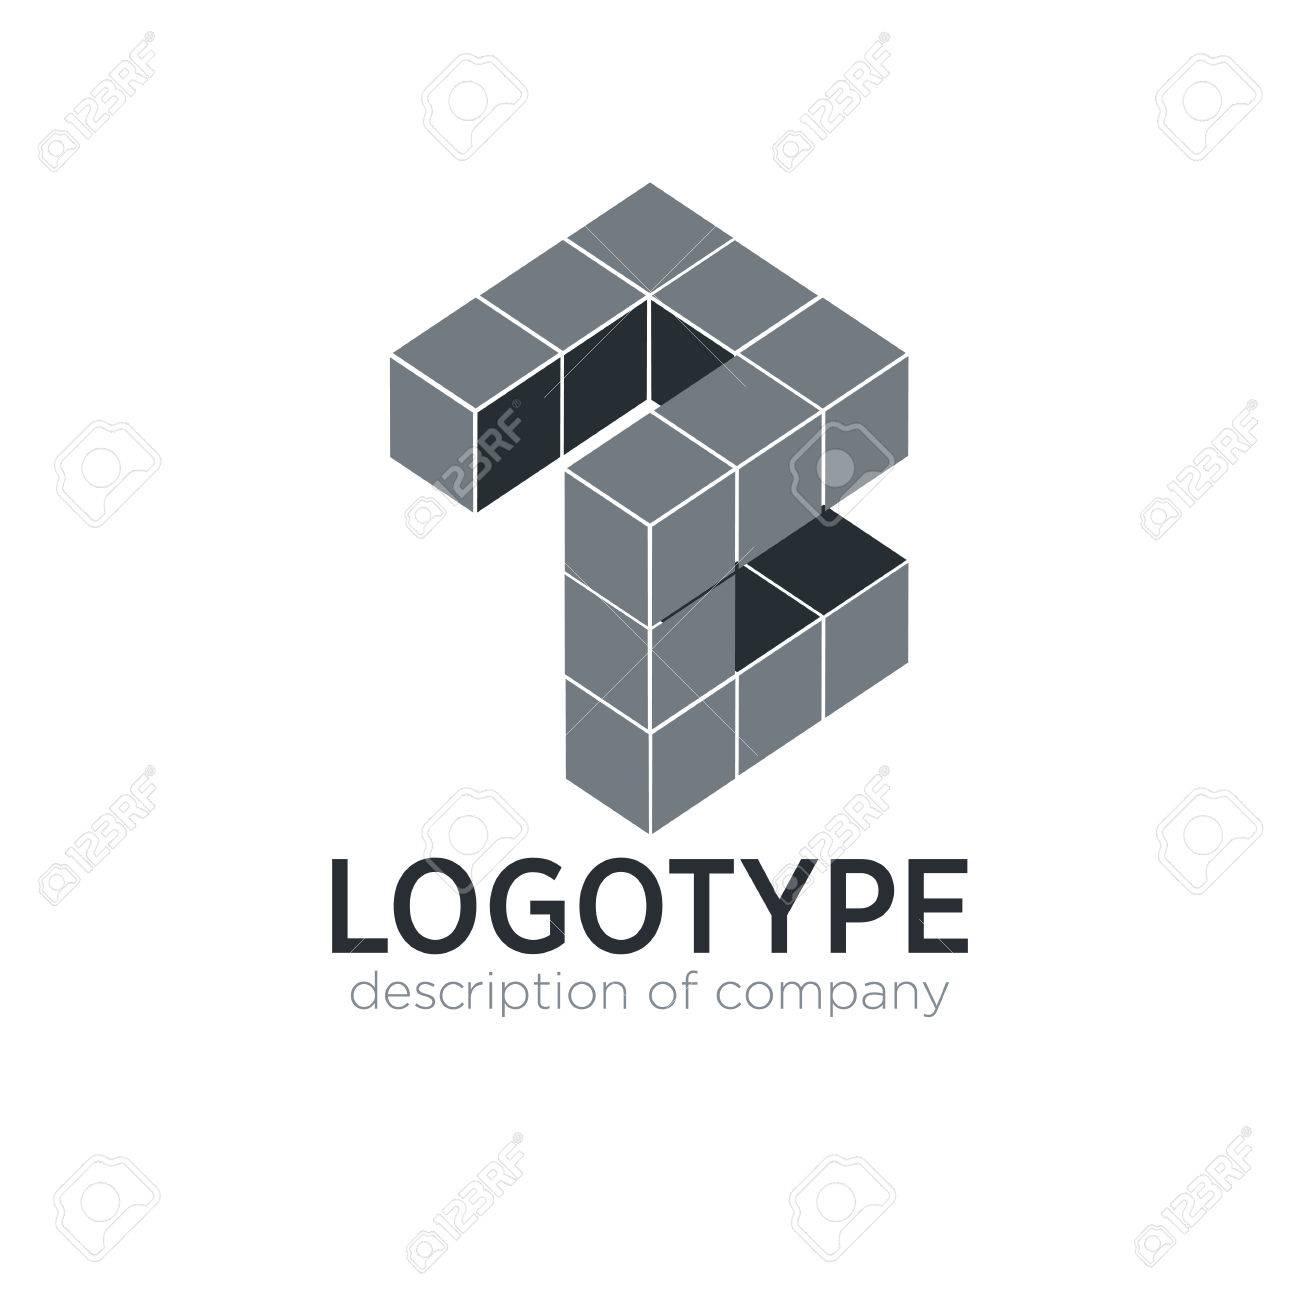 Letter Z cube figure logo icon design template elements - 83859824